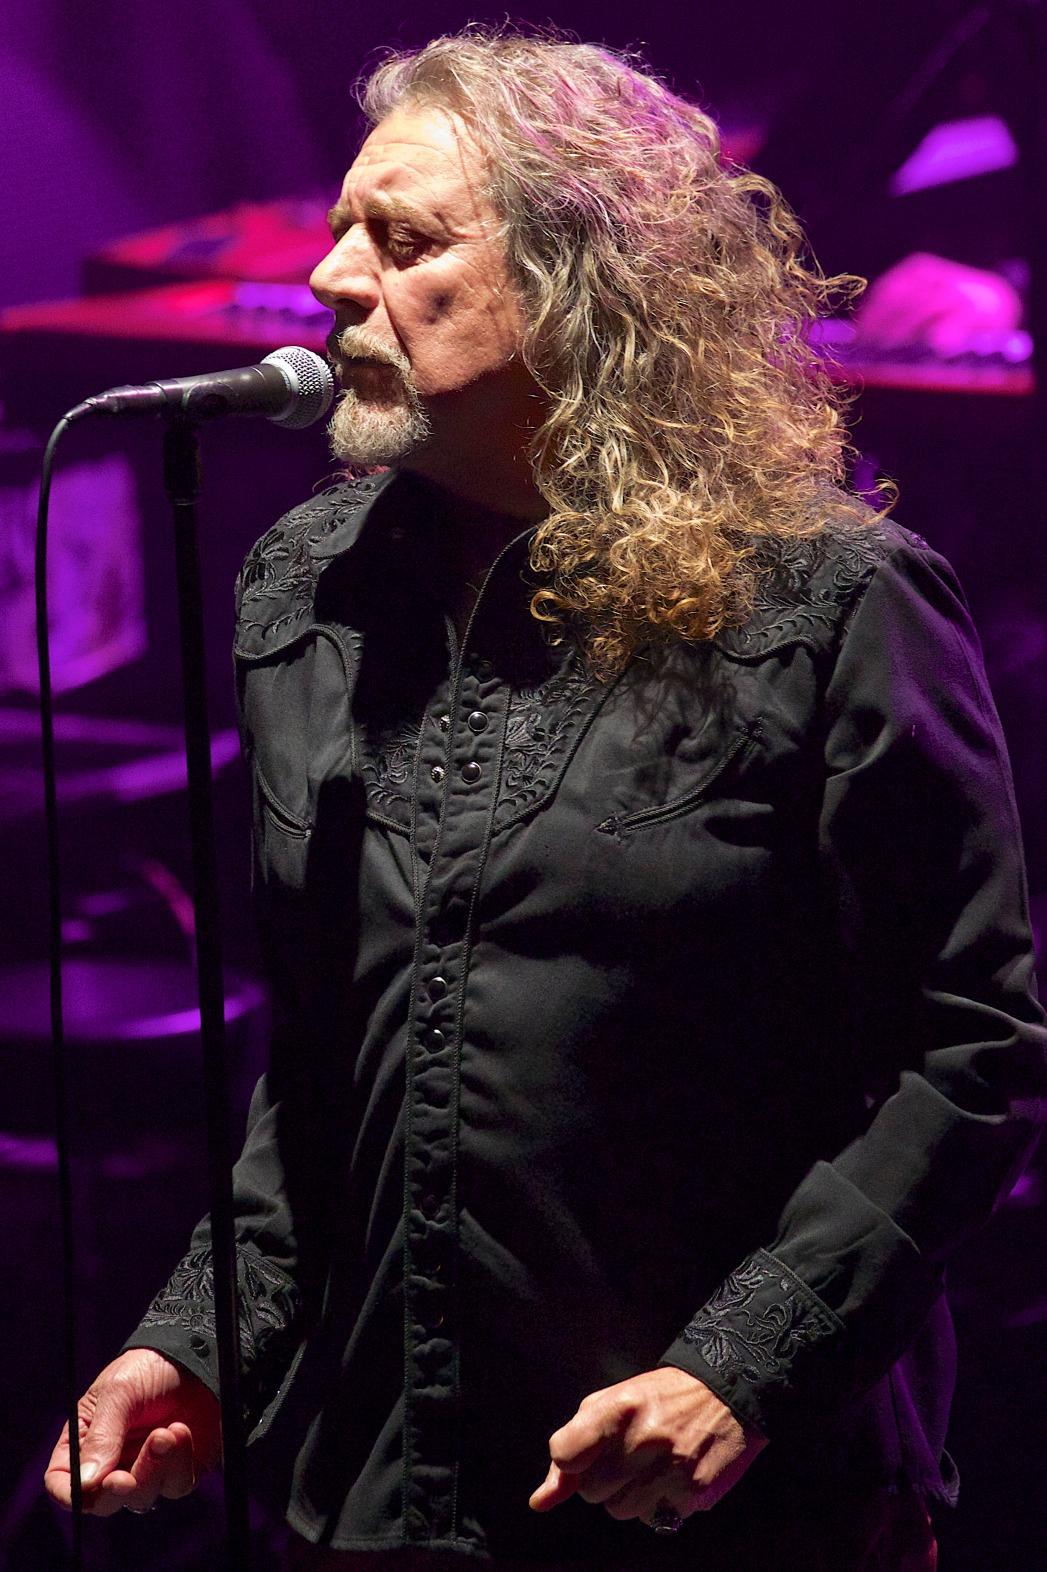 Robert Plant Concert - P - 2014